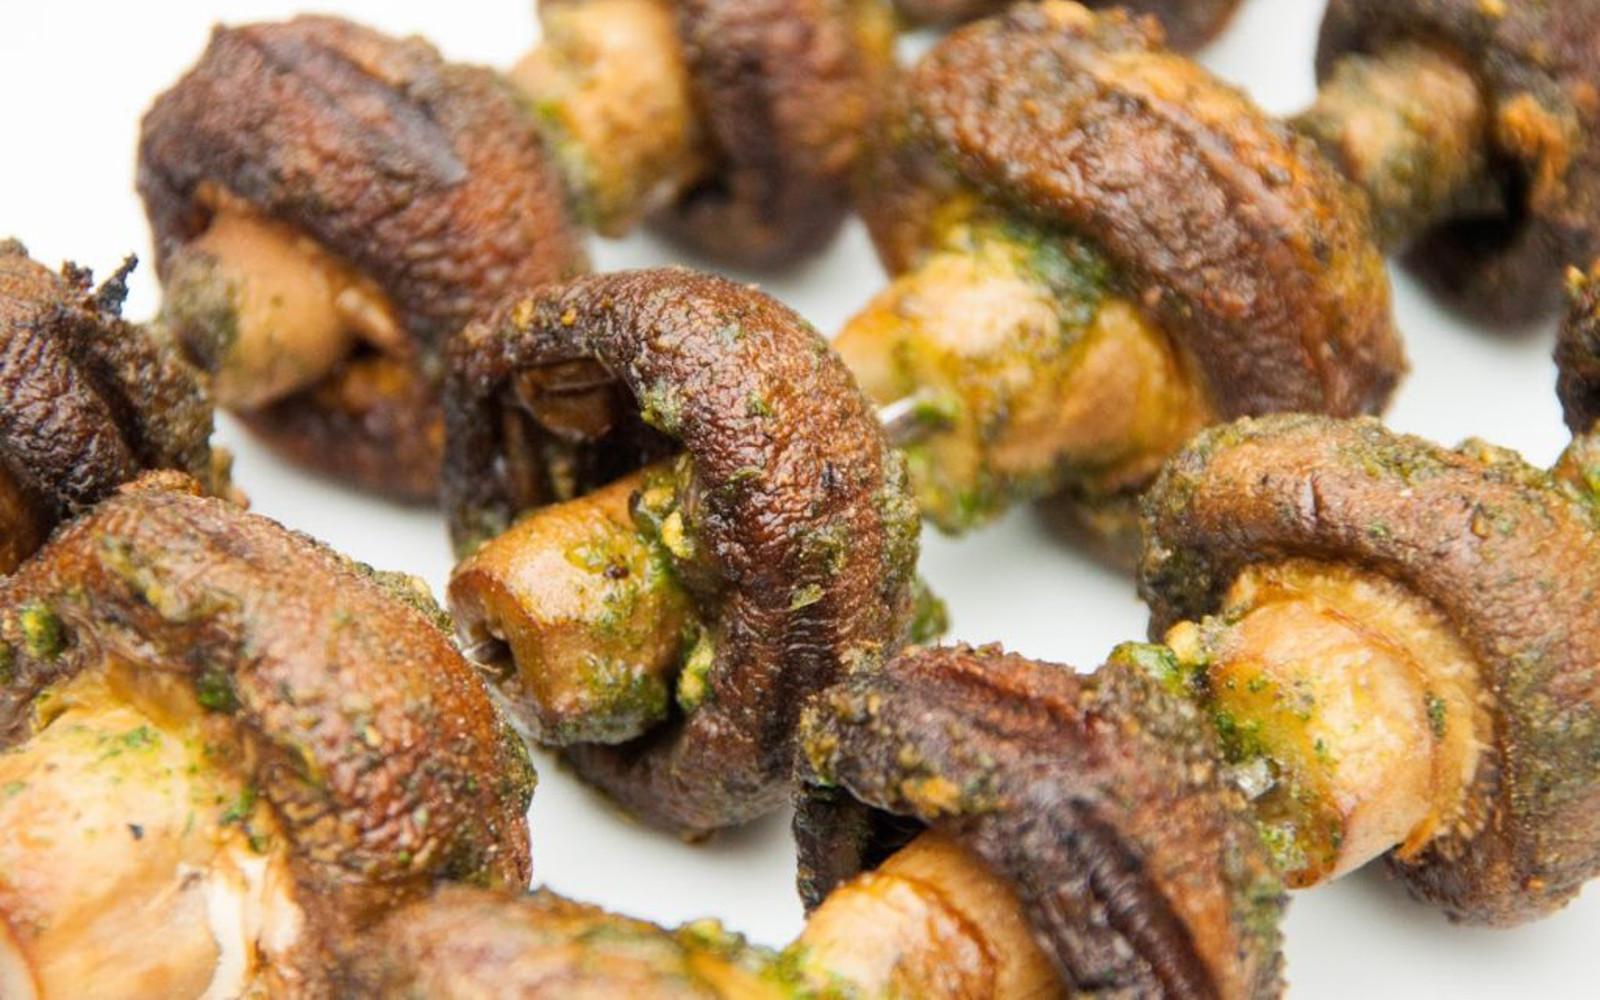 Garlicky Barbecue Mushroom Kebabs